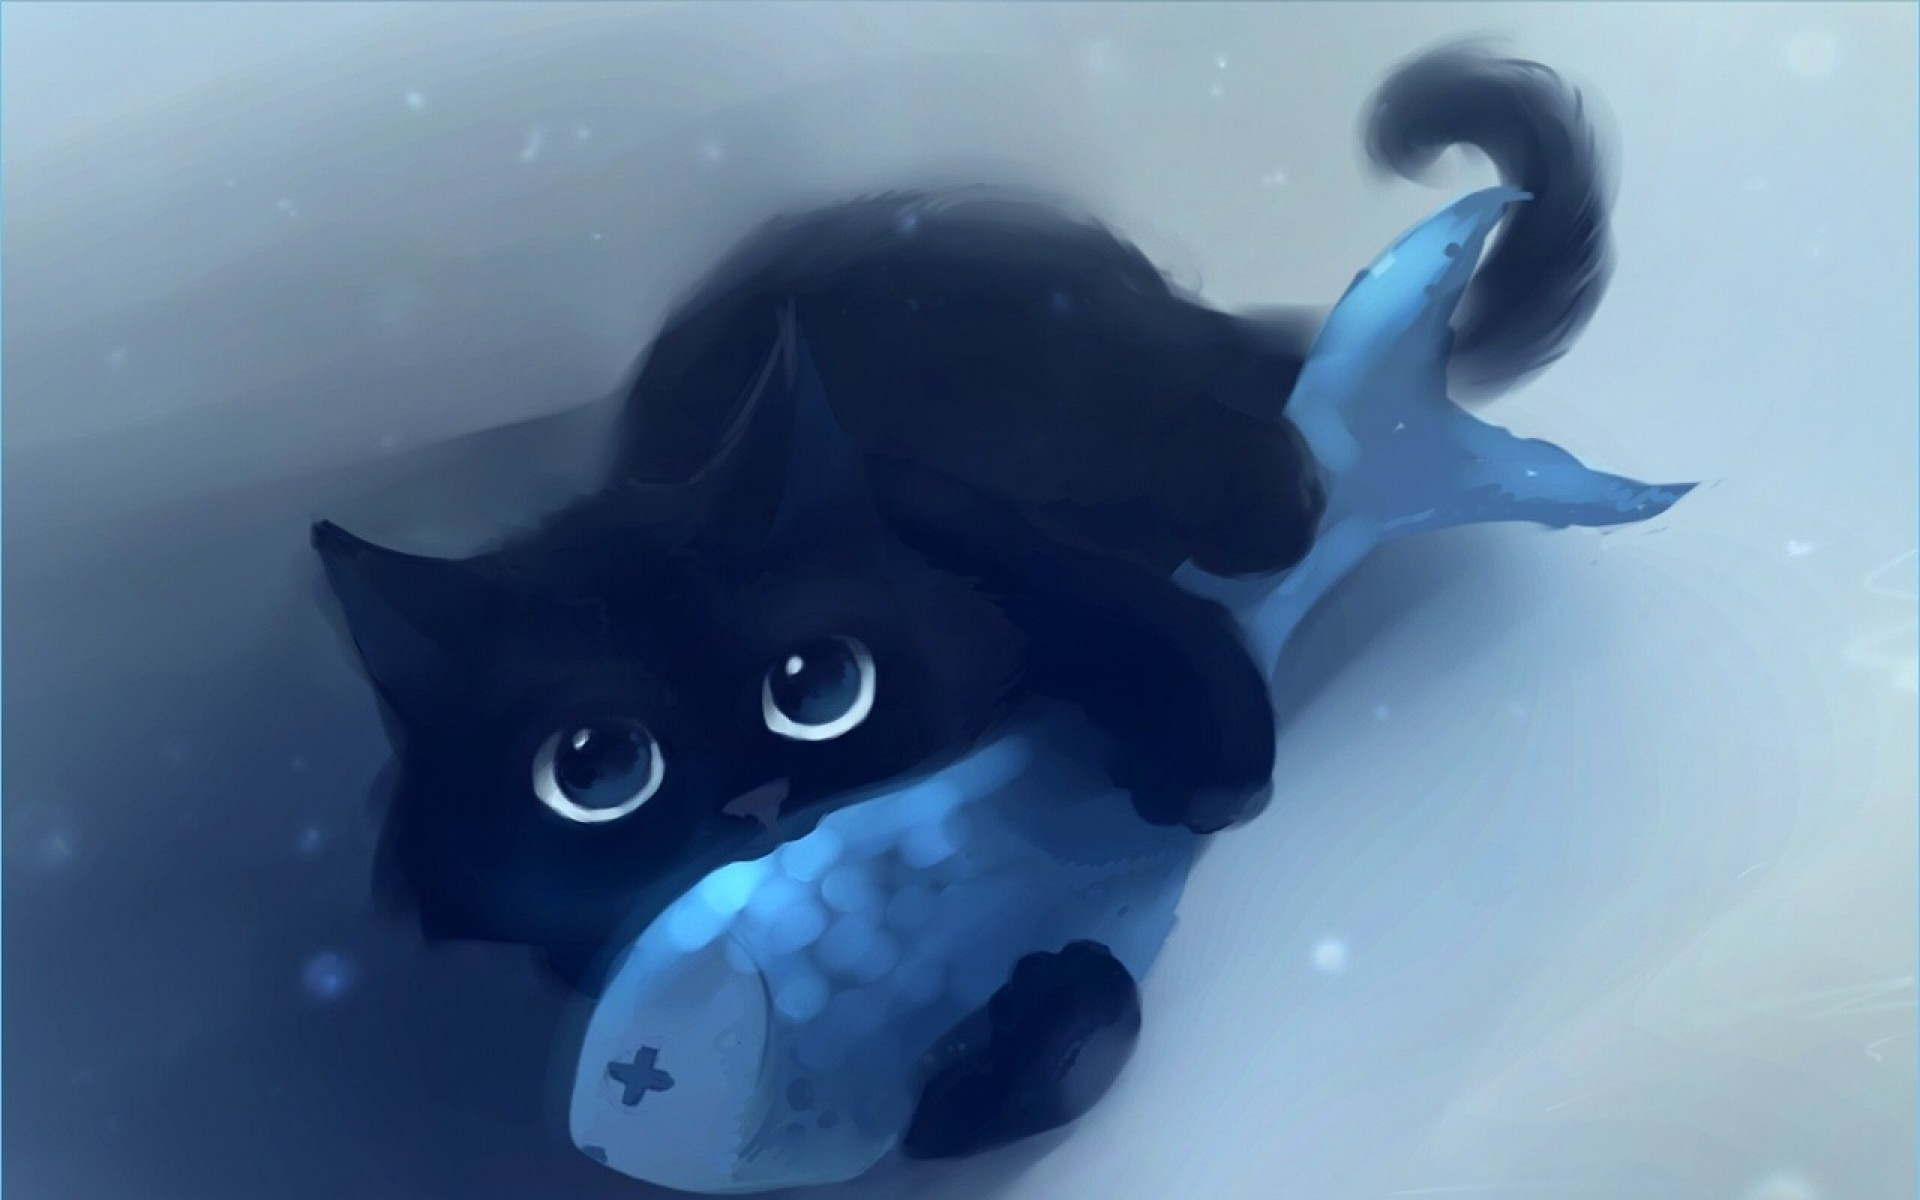 Black Cat & Blue Fish desktop PC and Mac wallpaper